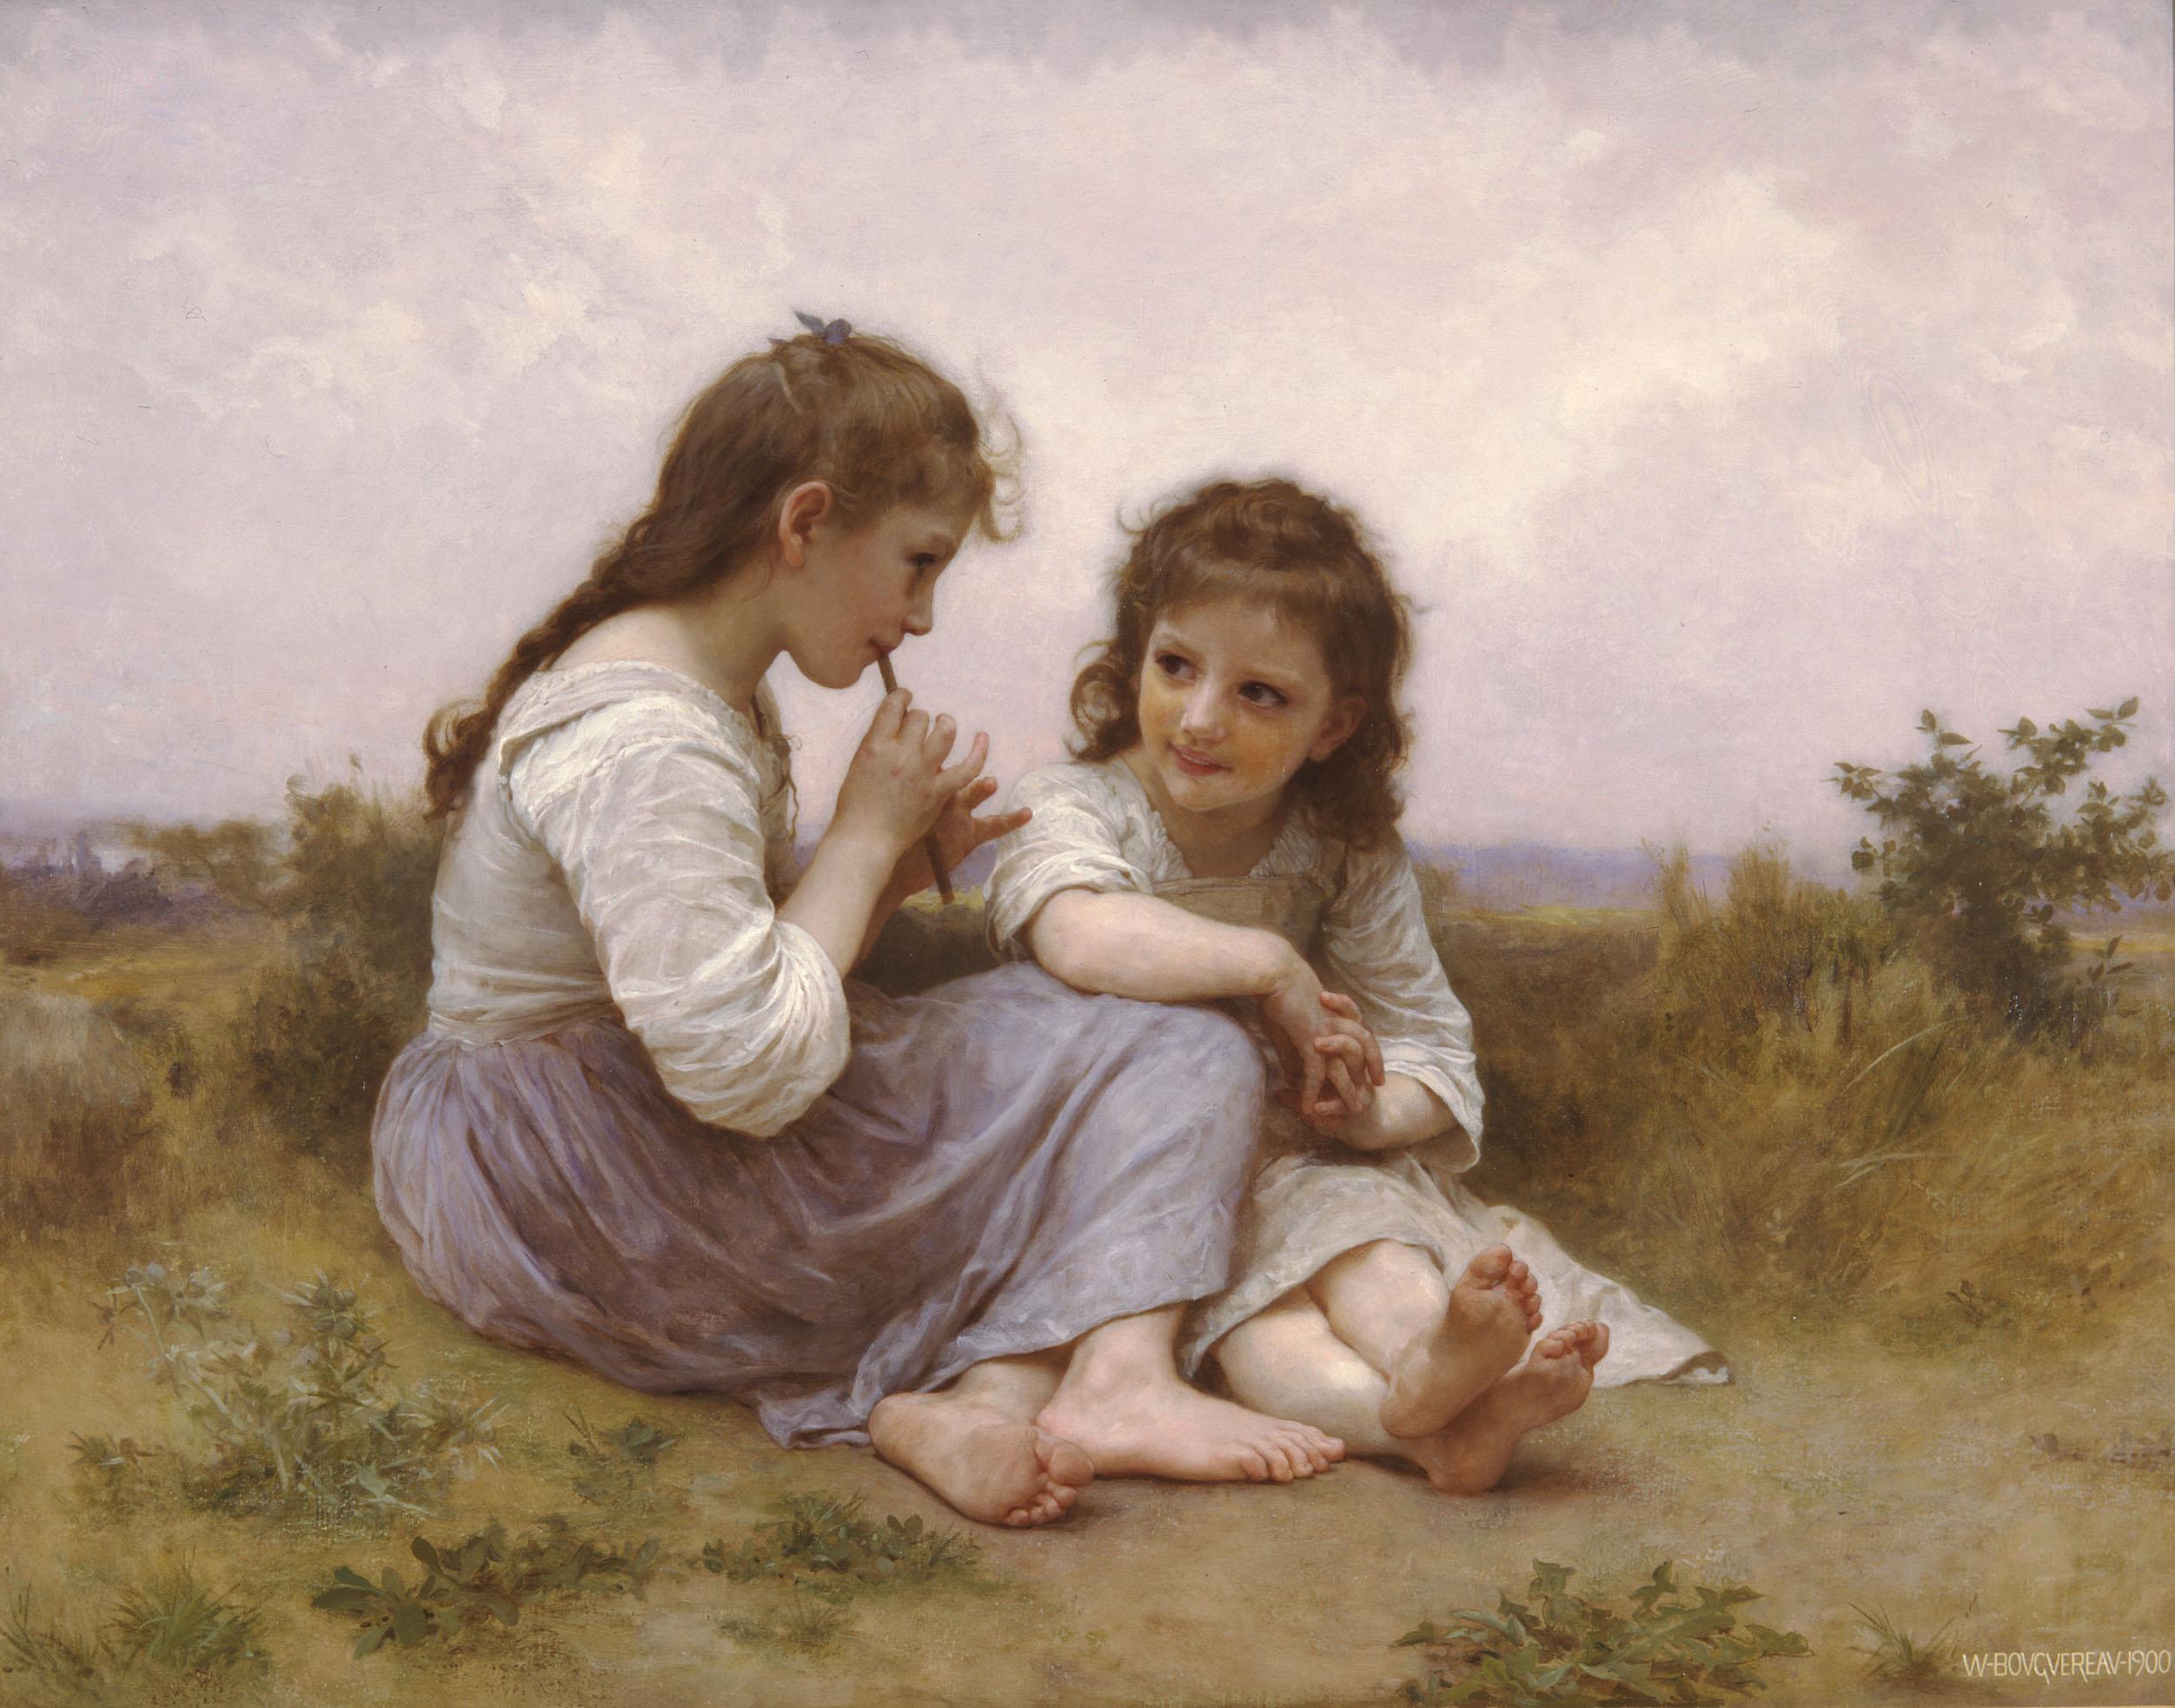 Childhood Idyll by William-Adolphe Bouguereau